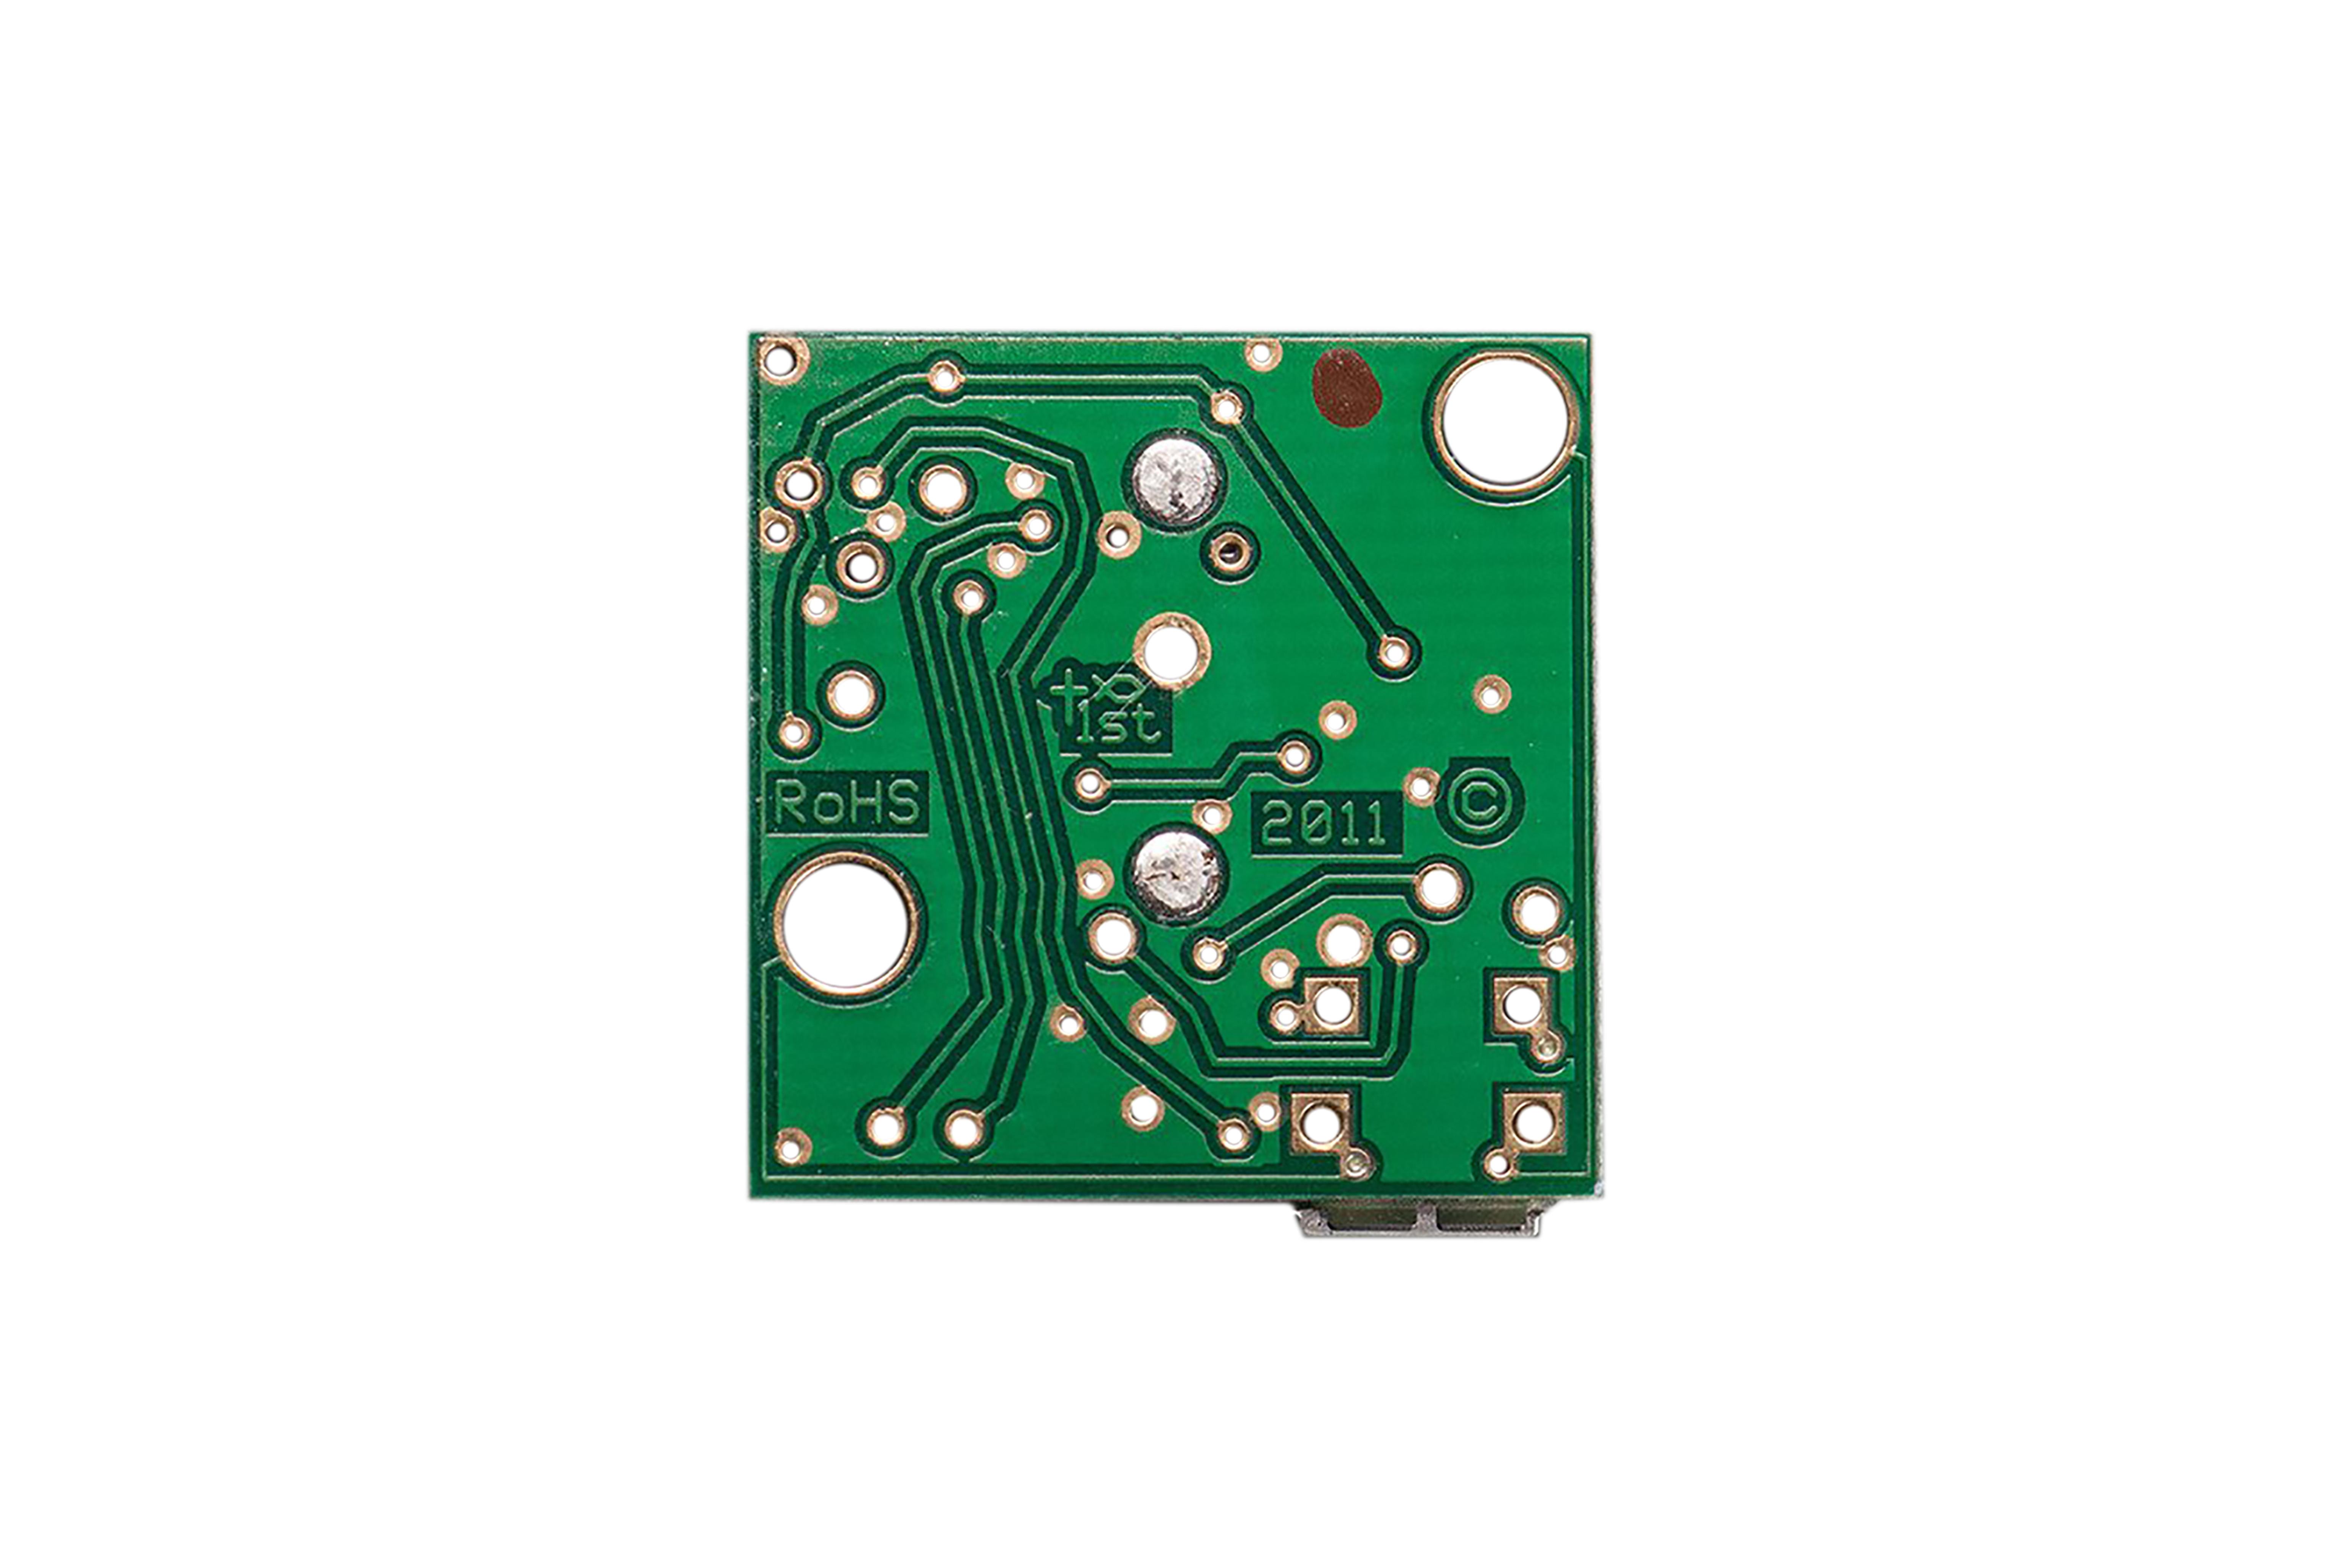 MAXBOTIX ULTRASONE AFSTANDSMETER -USB